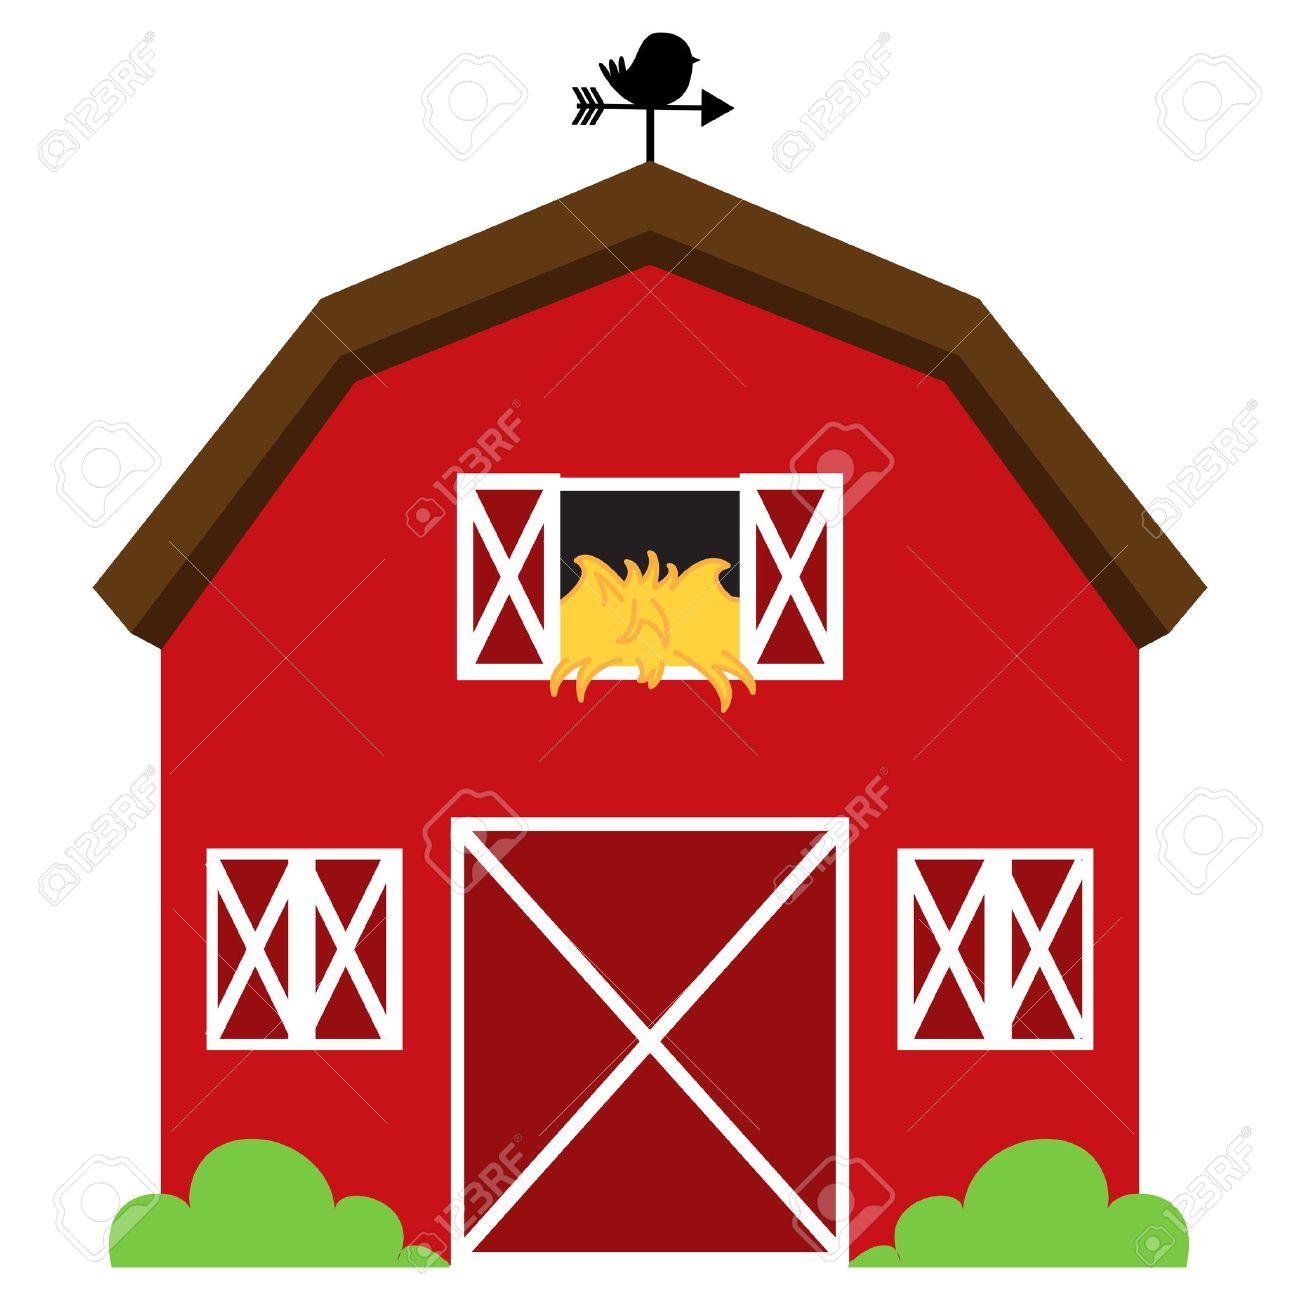 1300x1300 Barn Clip Art Amp Barn Clipart Images